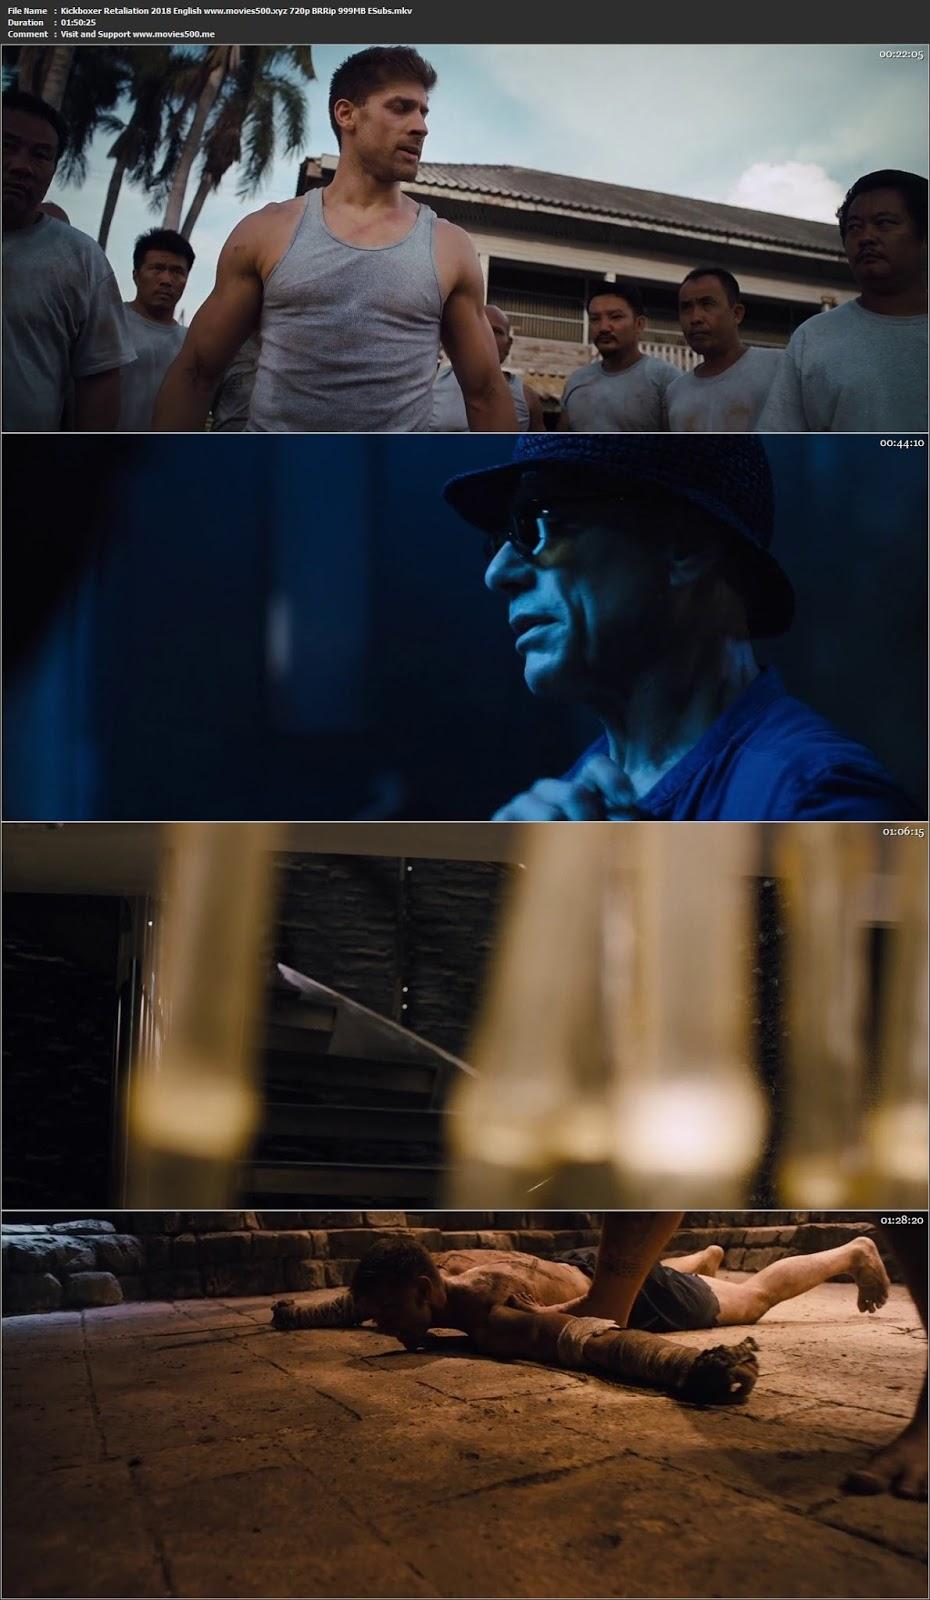 Kickboxer Retaliation 2018 English Full Movie BRRip 720p ESubs at movies500.bid